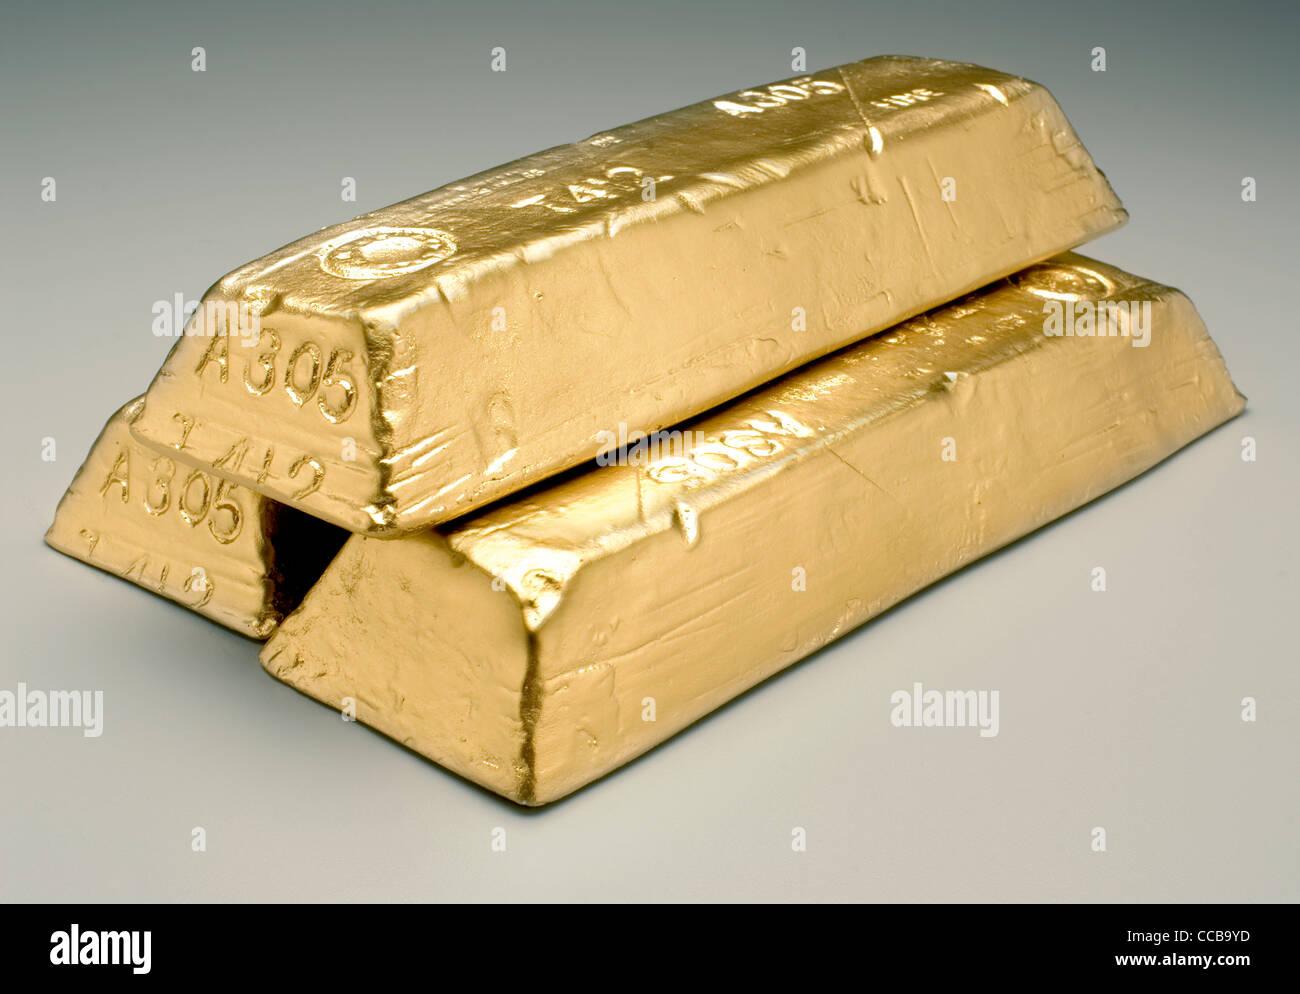 gold bars on grey background - Stock Image